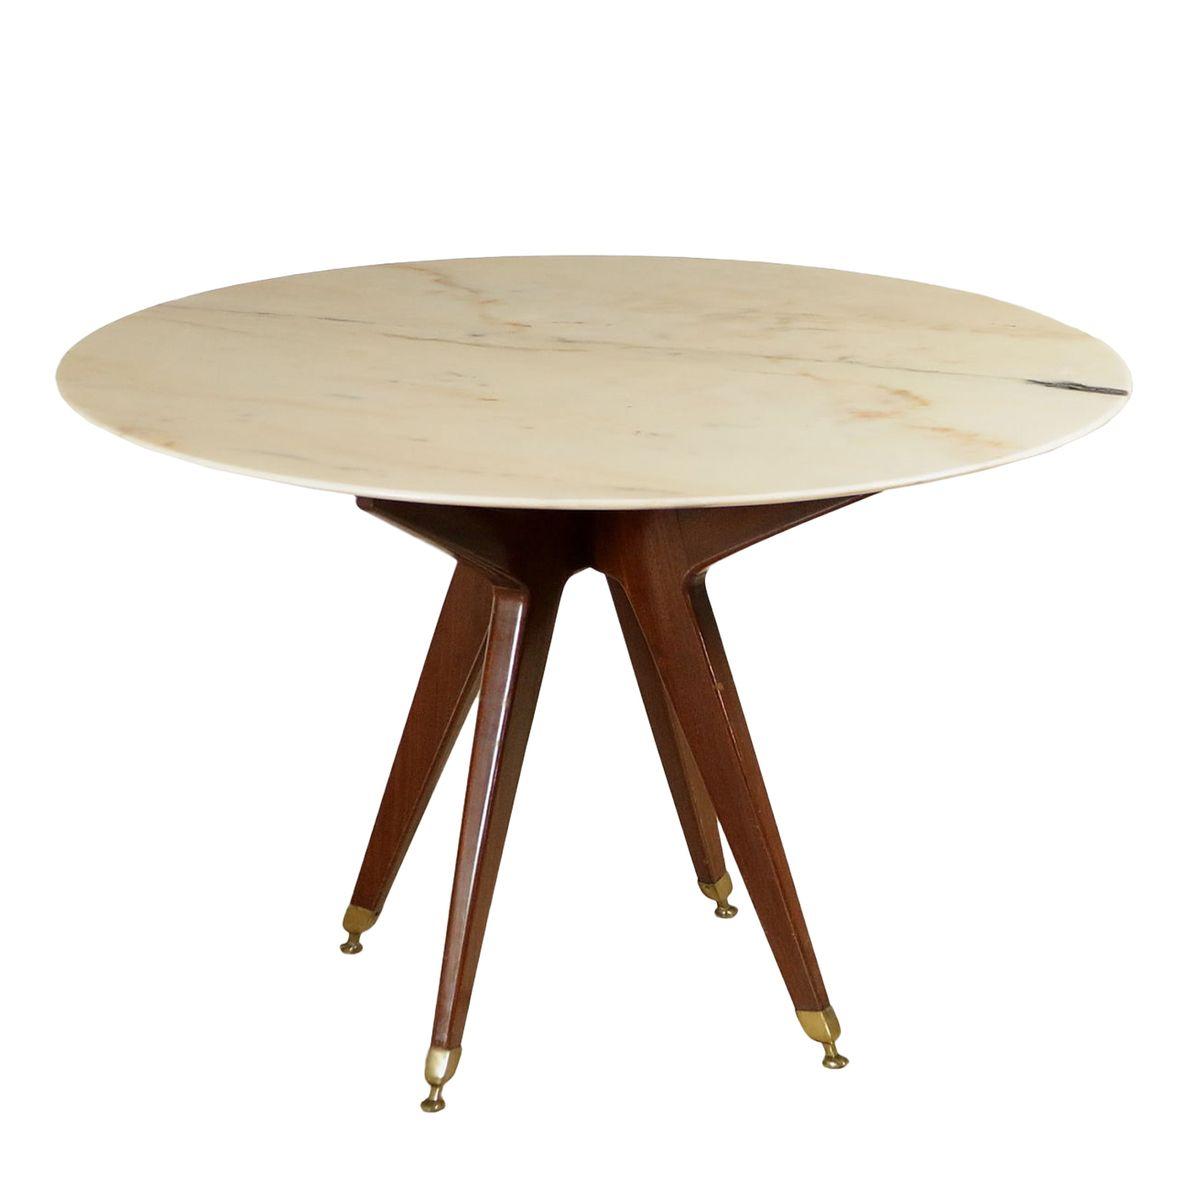 tisch aus gebeiztem mahagoni messing marmor 1950er bei. Black Bedroom Furniture Sets. Home Design Ideas